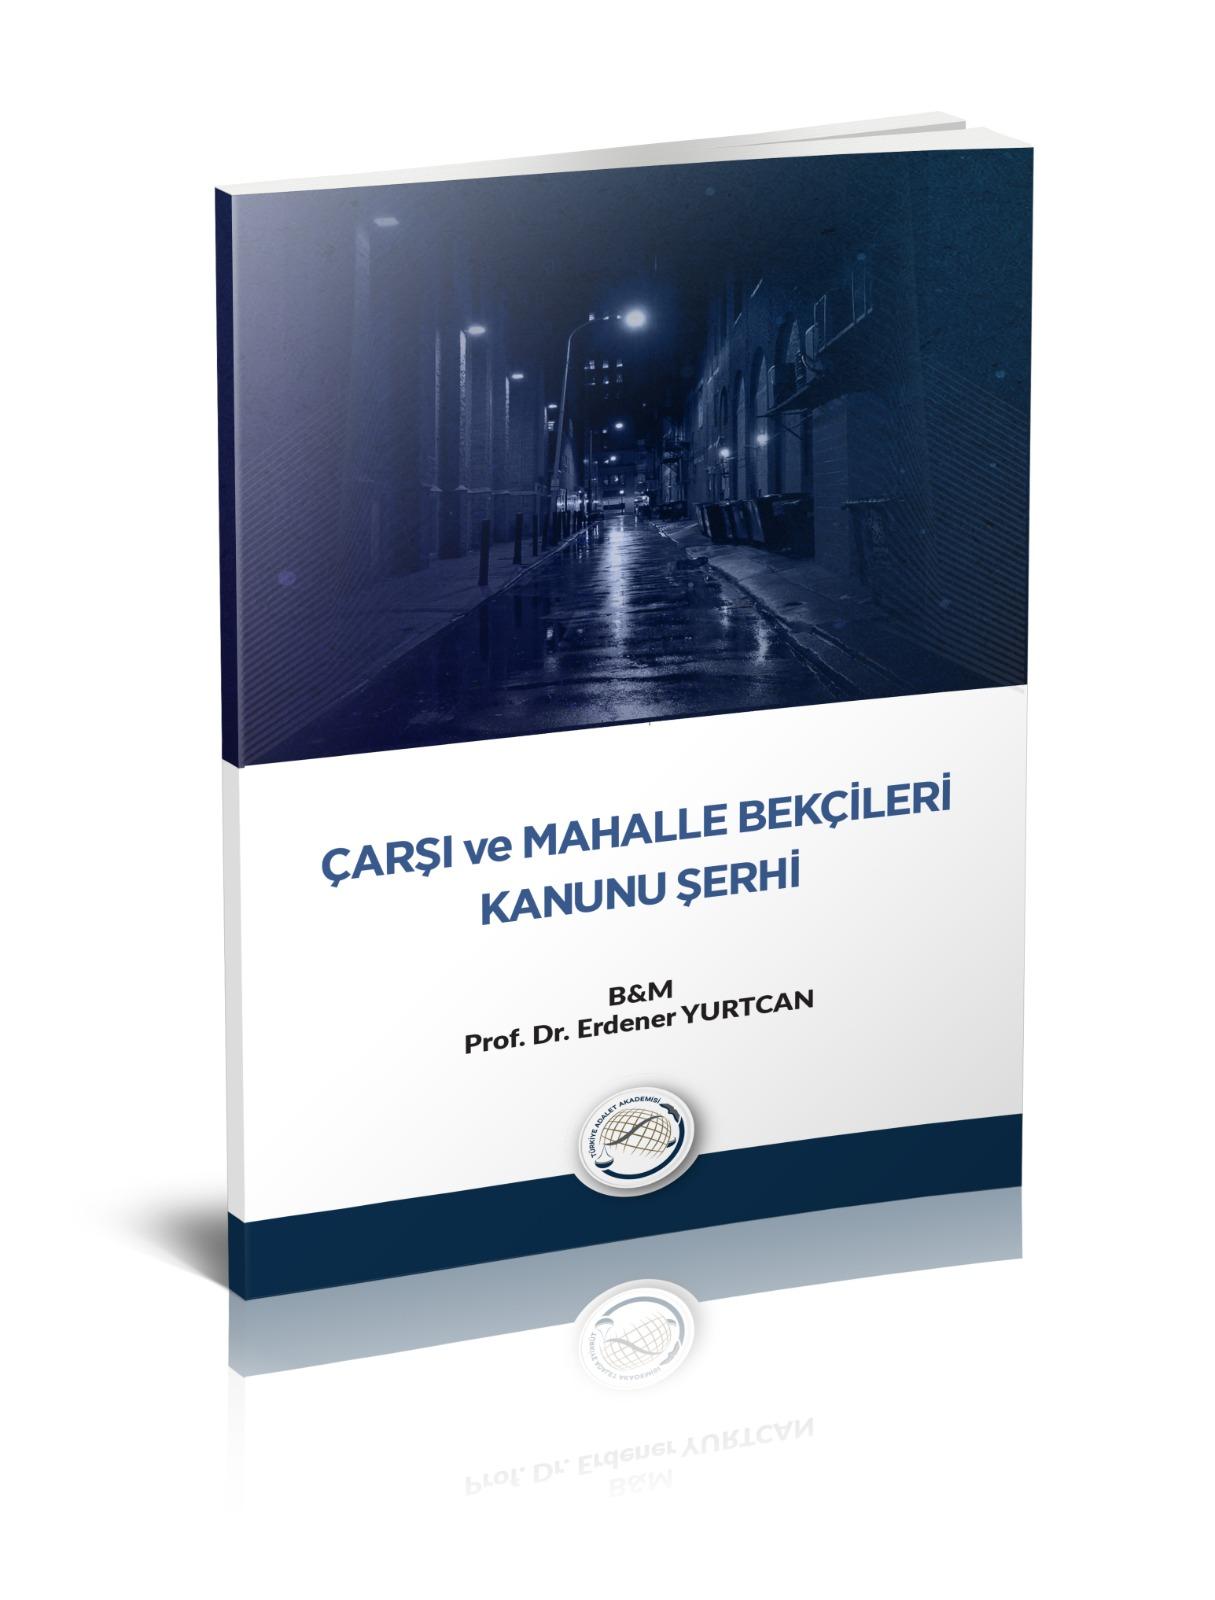 turkiye adalet akademisi yayinlari